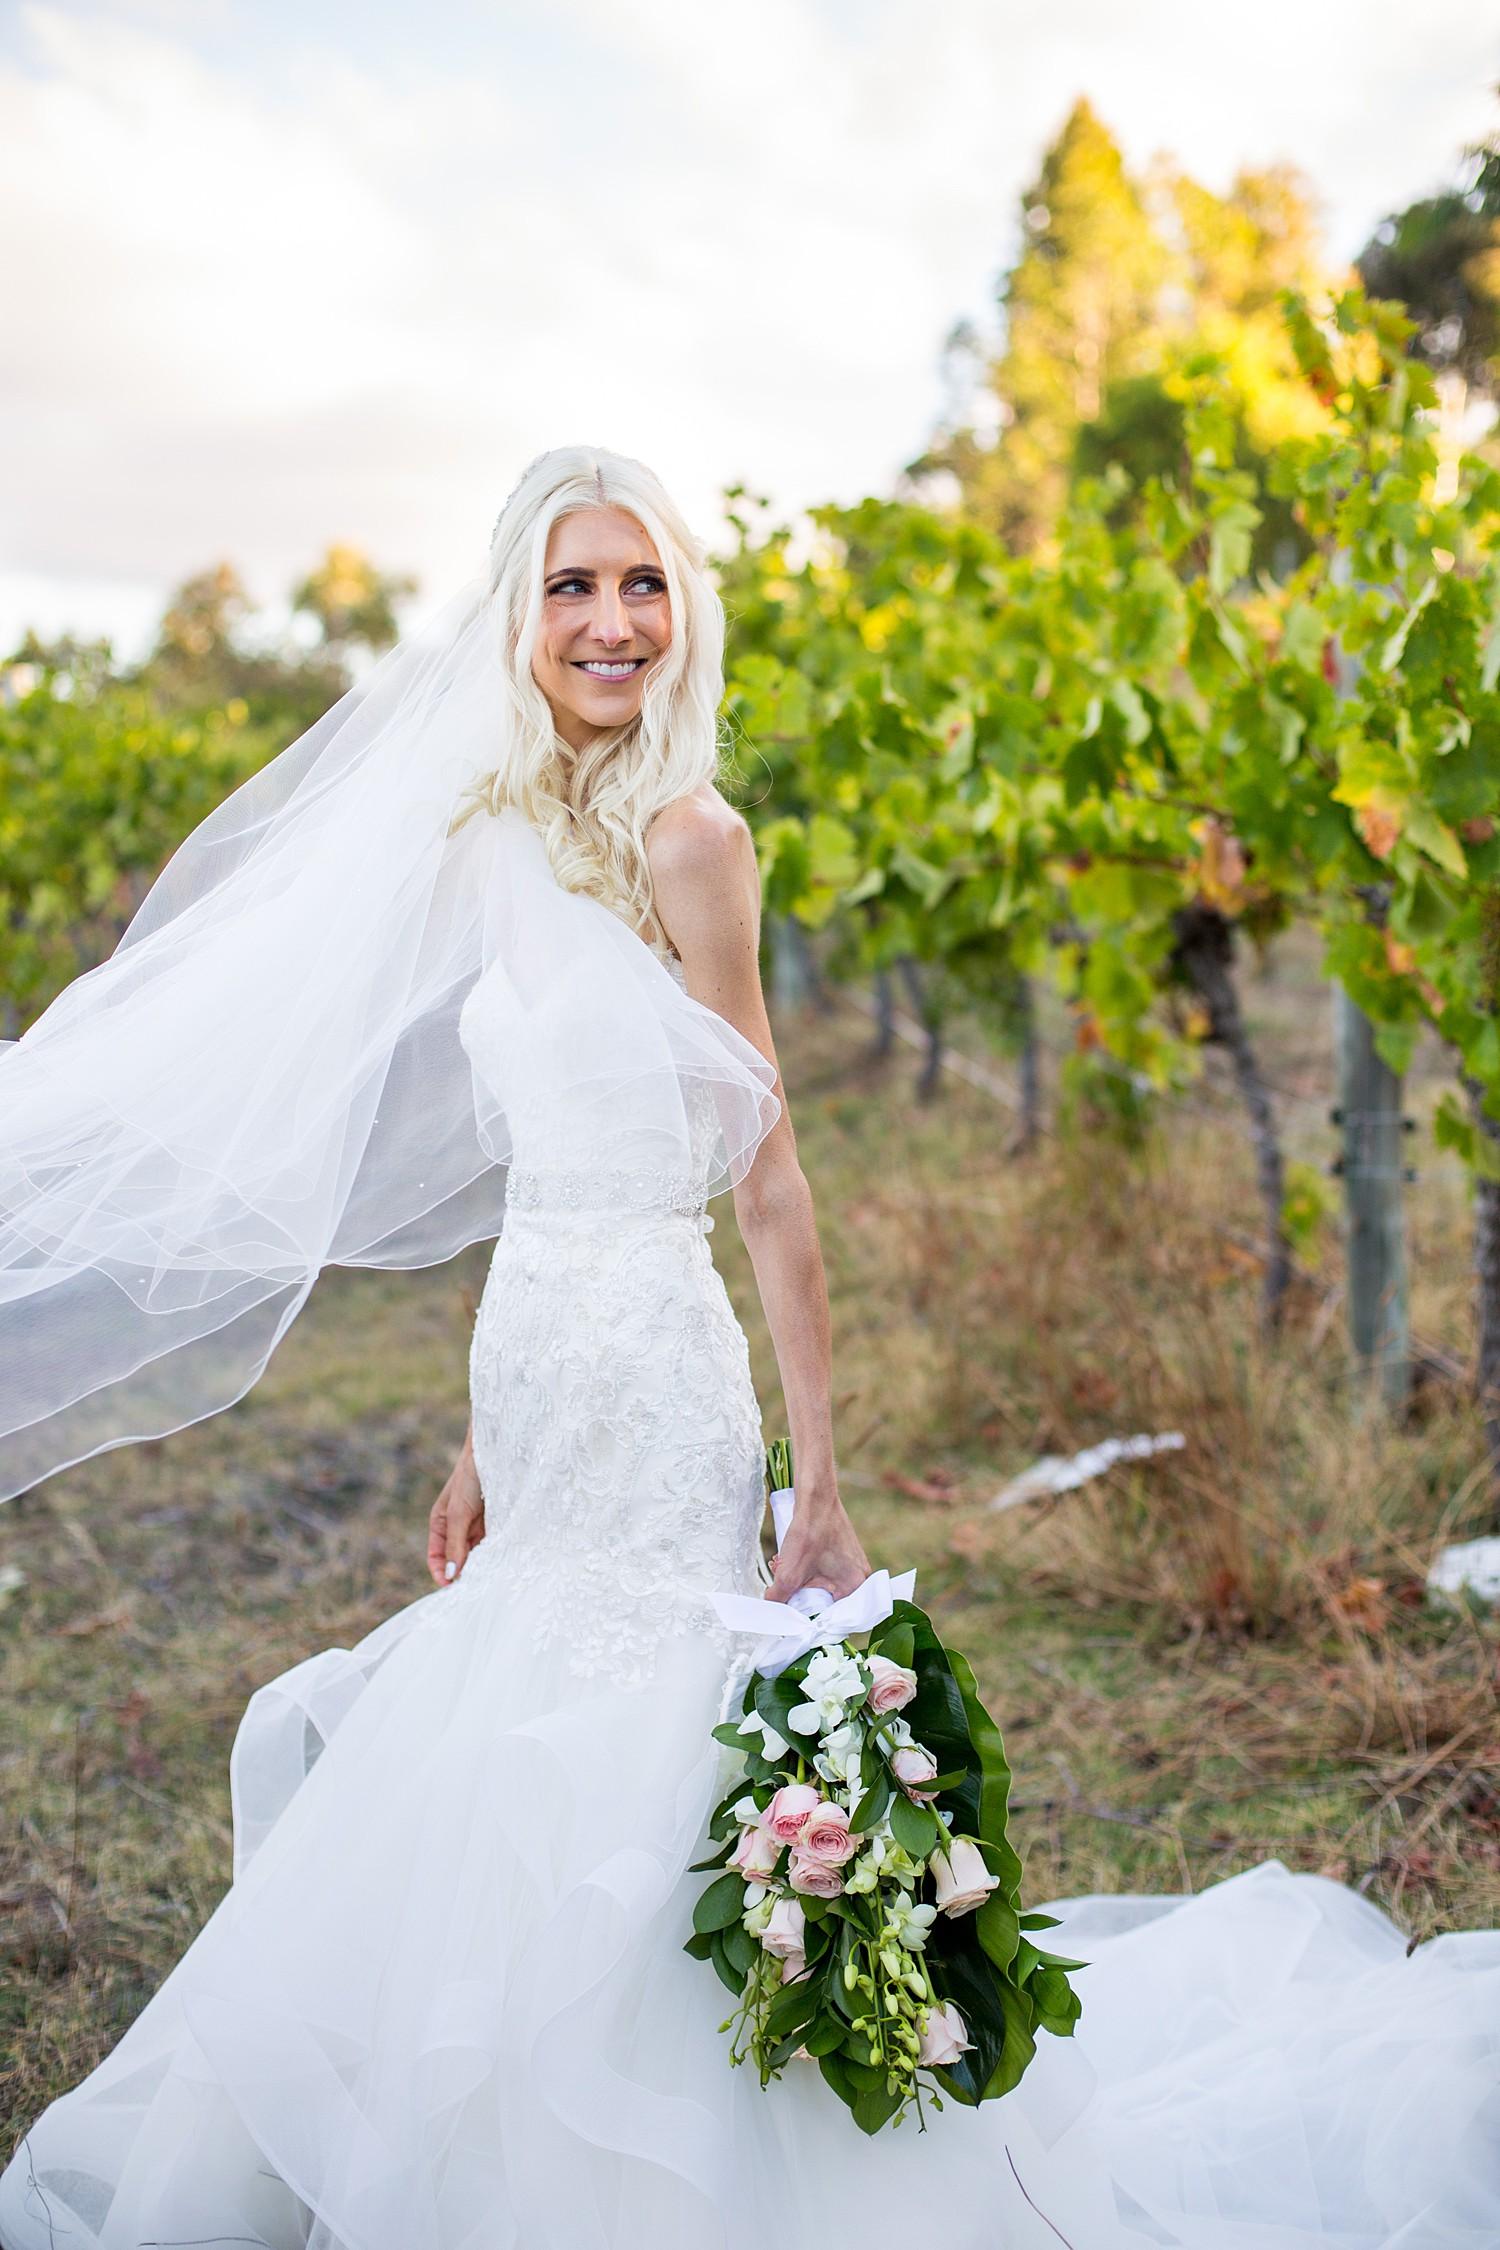 wise_wines_southwest_WA_wedding_0102.jpg